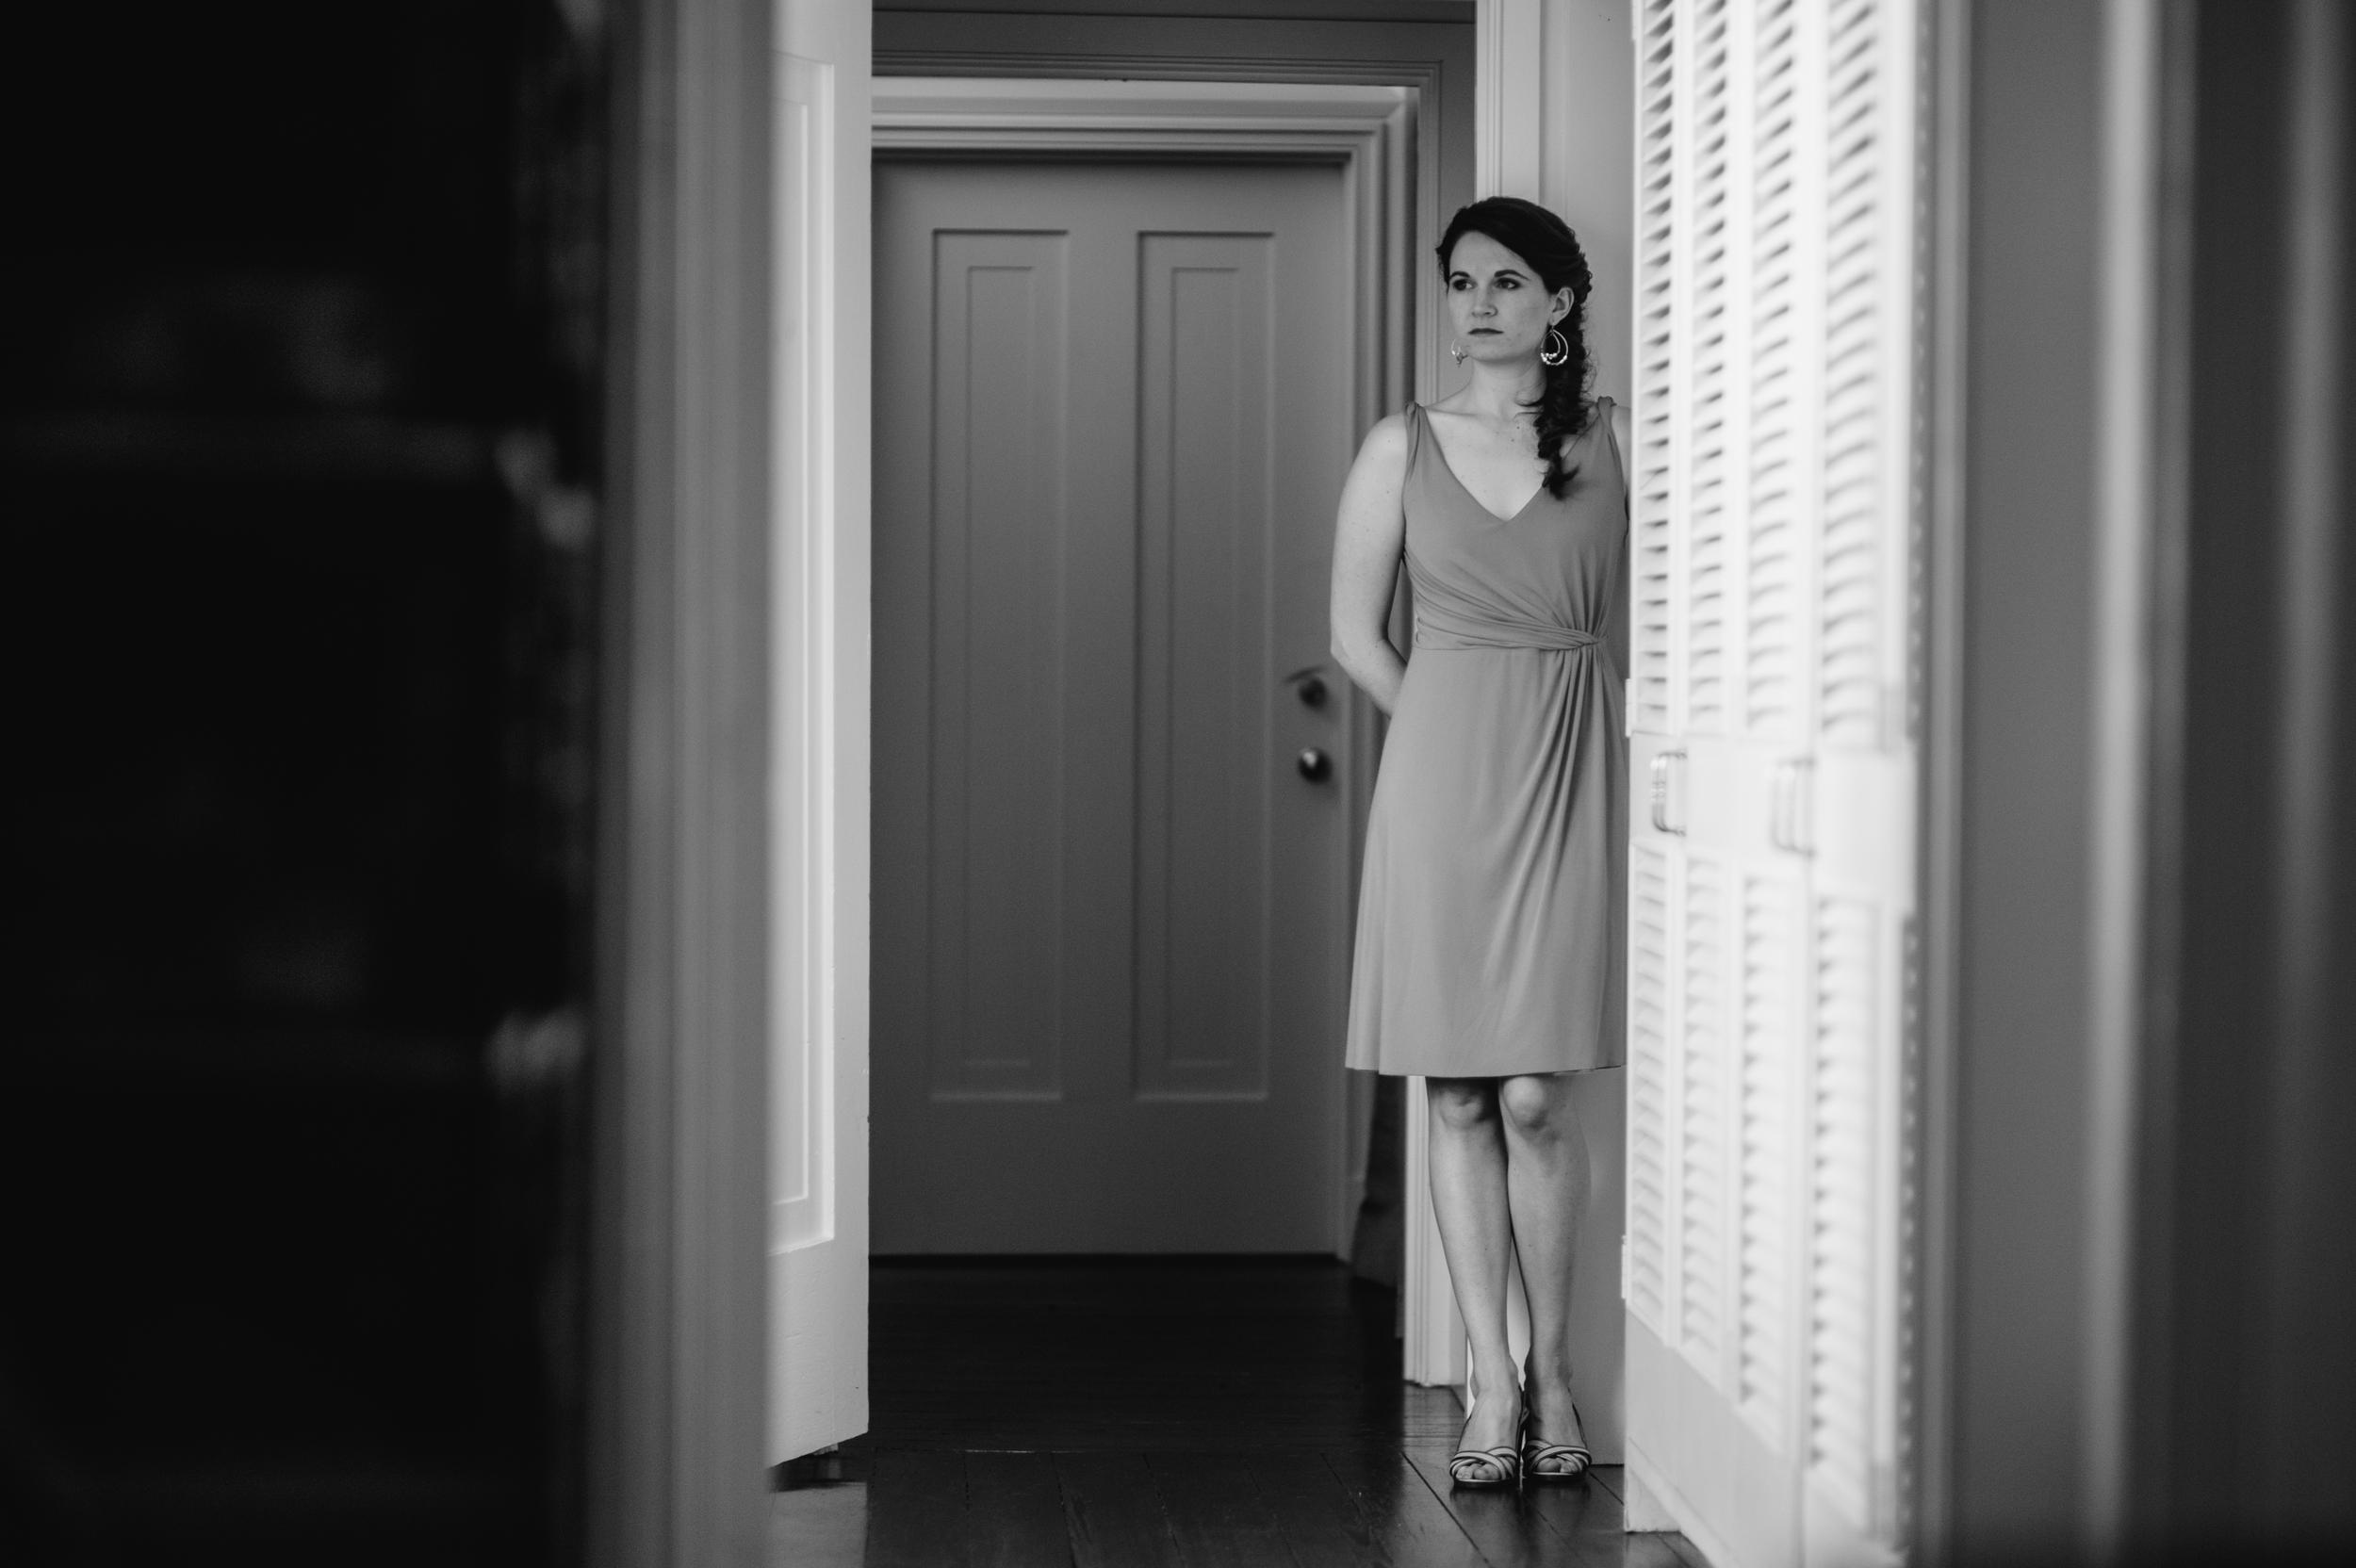 Artistic Wedding Photographer Mantas Kubilinskas-13.jpg